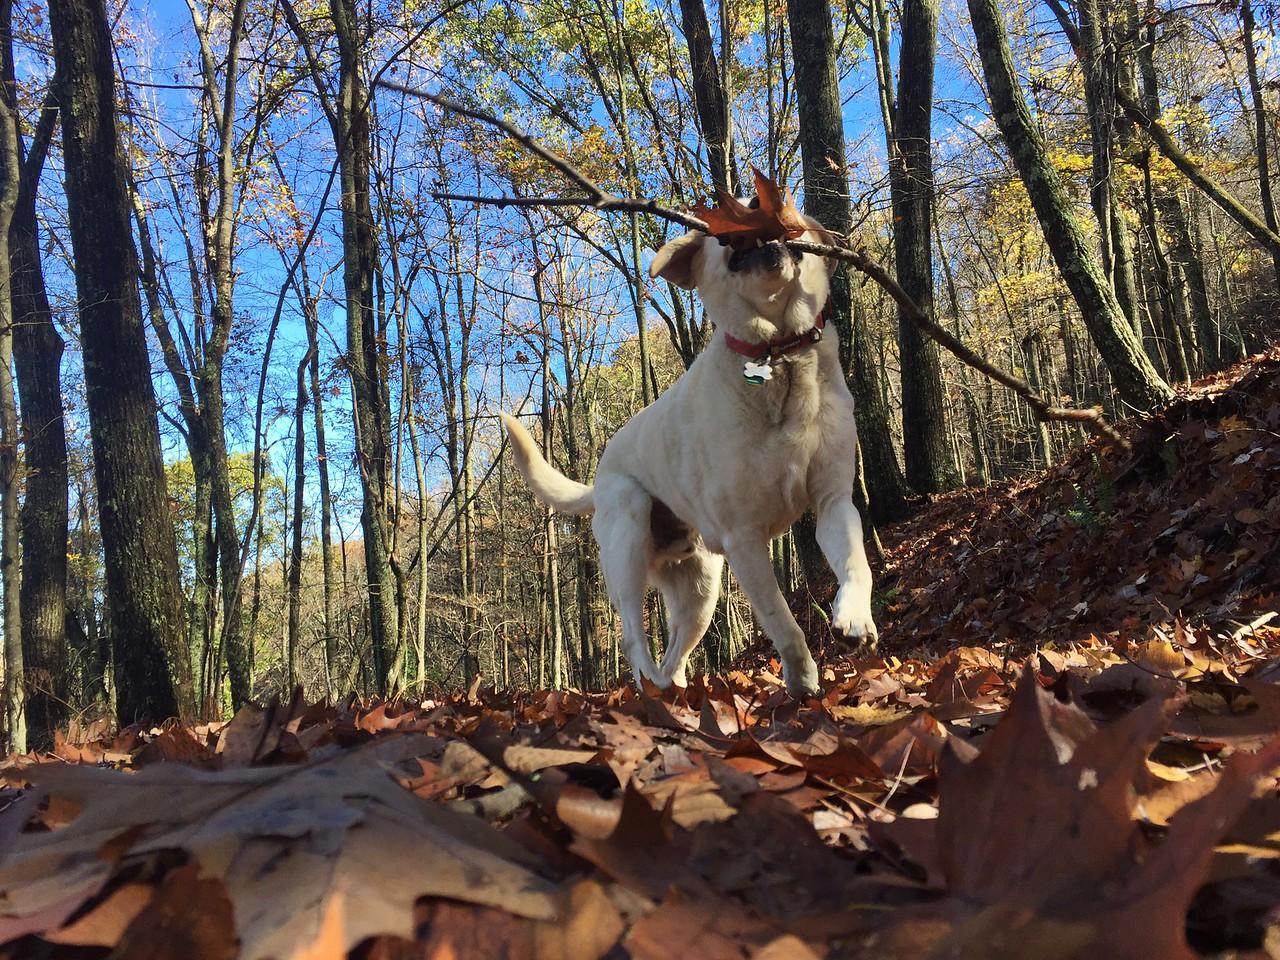 Day 151   November 10, 2015   near Blue Ridge, Georgia